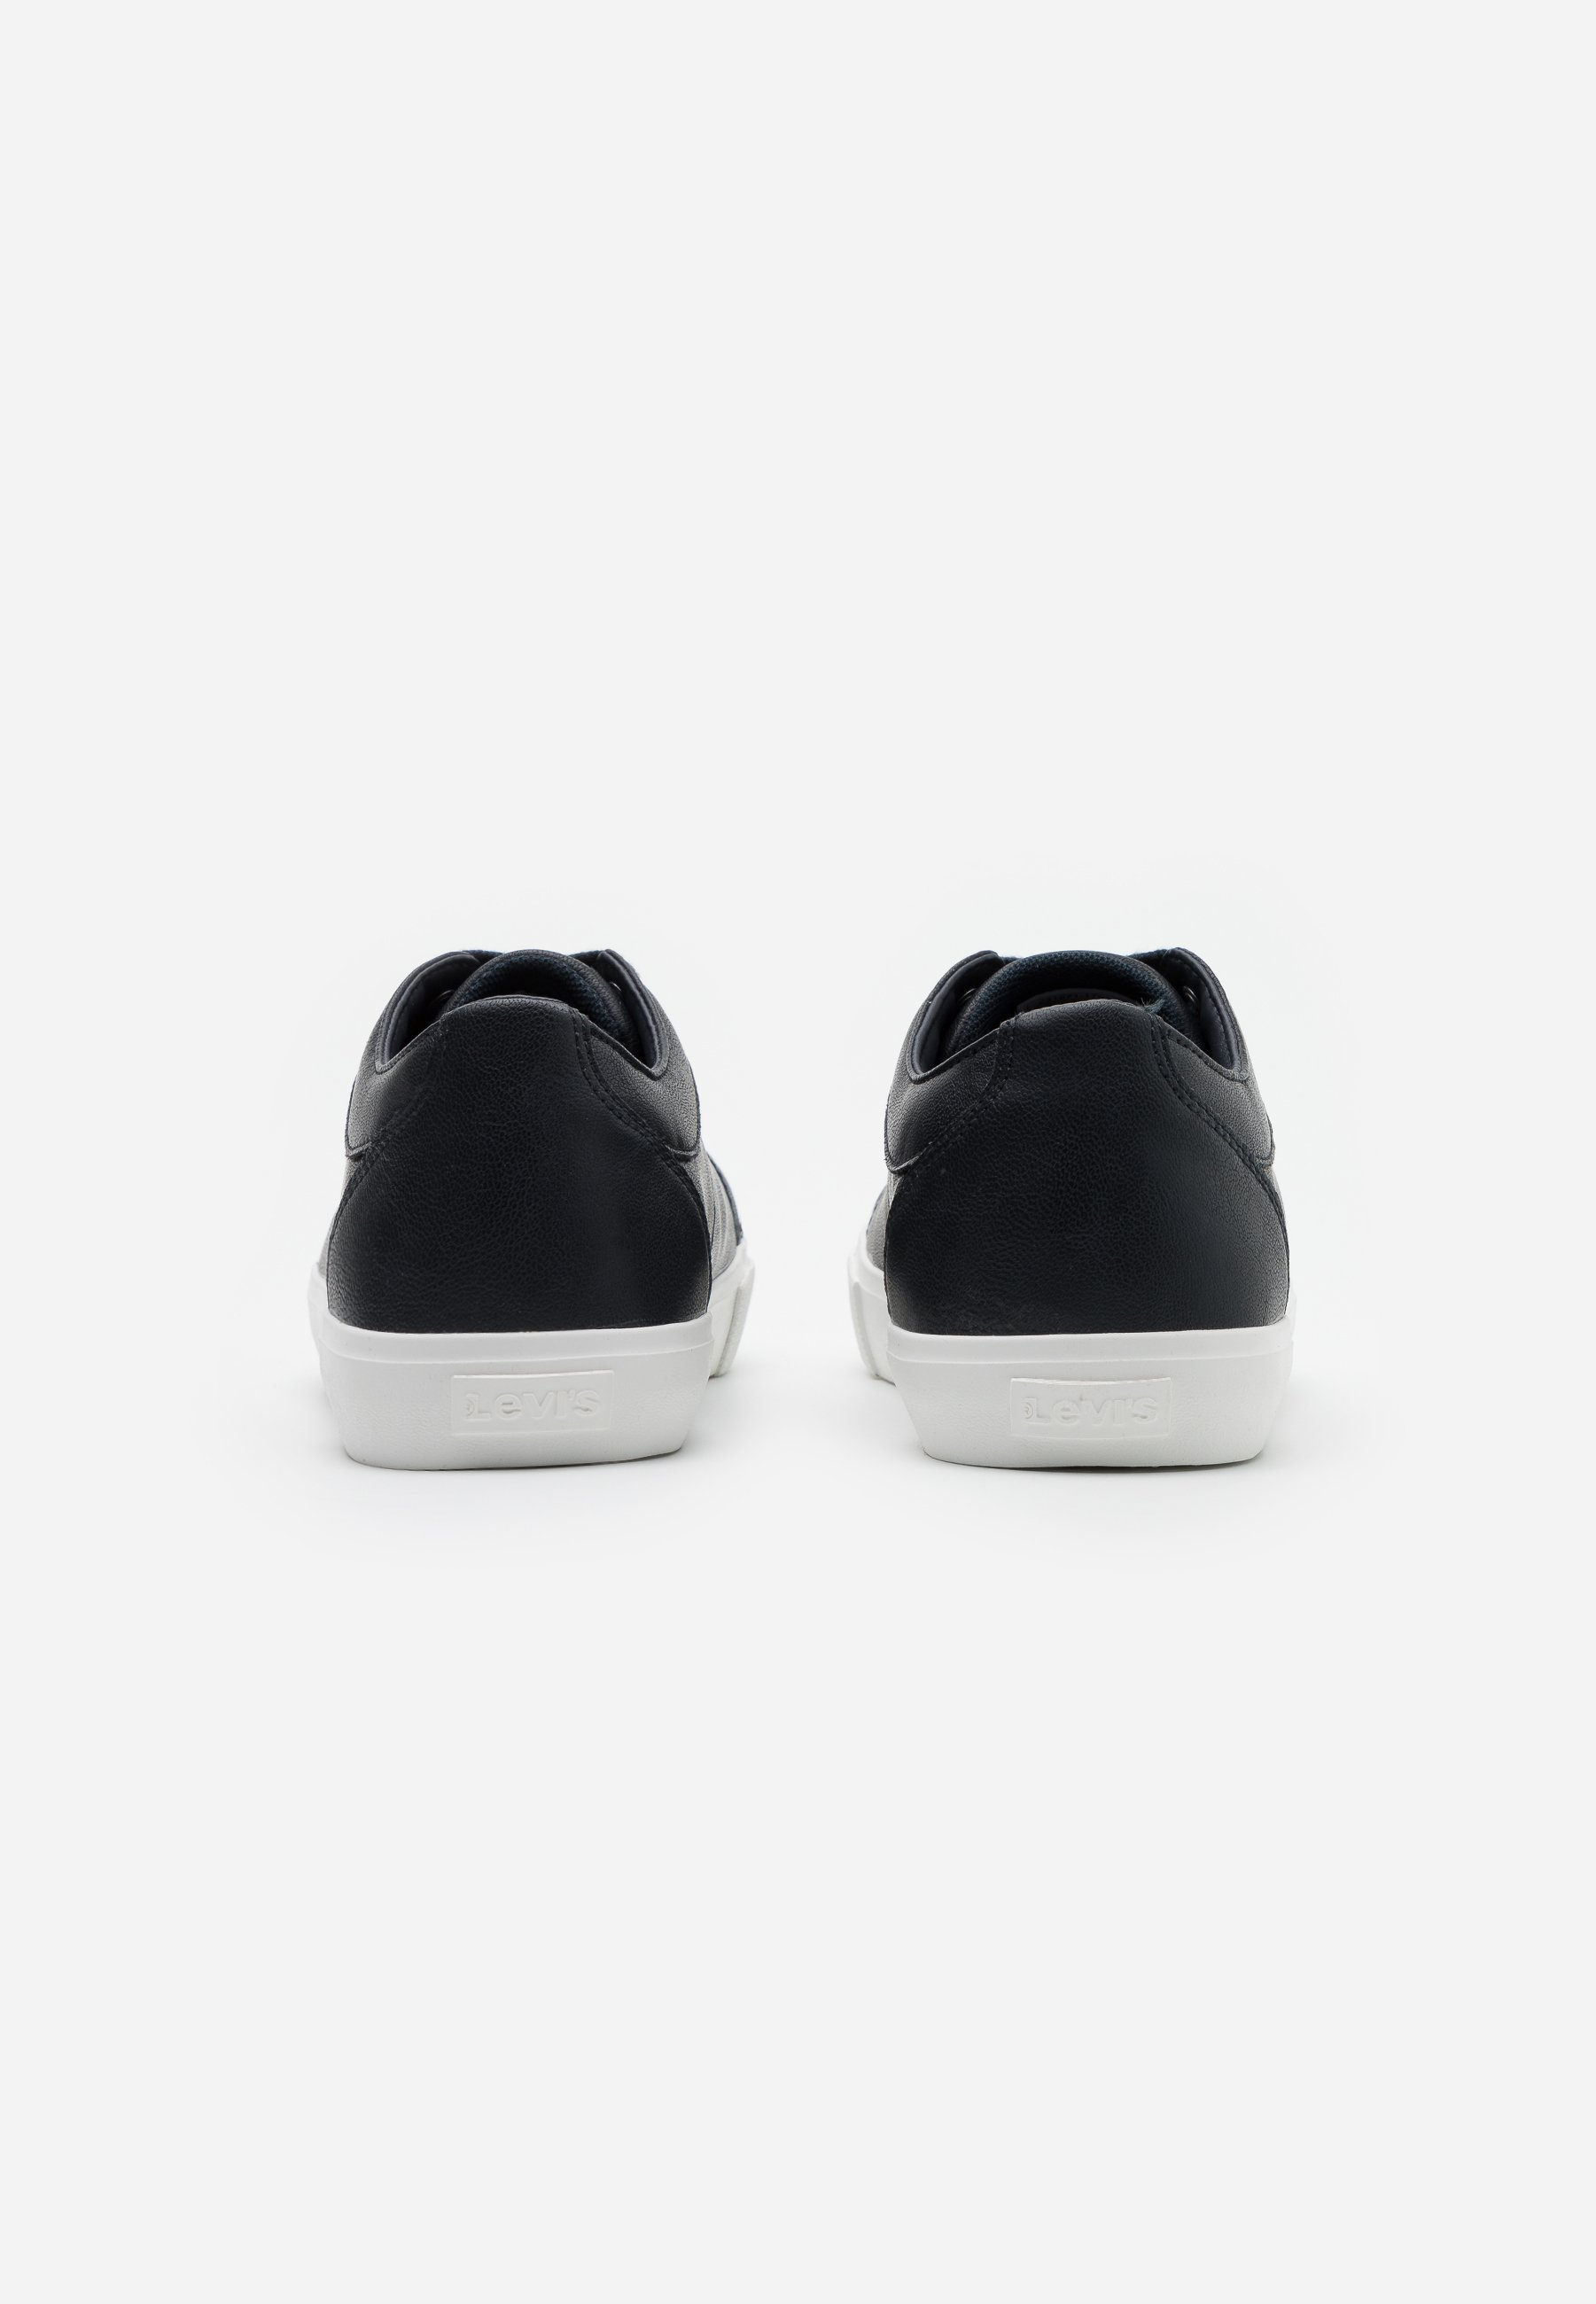 Levis® WOODWARD - Sneaker low - navy blue/dunkelblau - Herrenschuhe 1zCtP